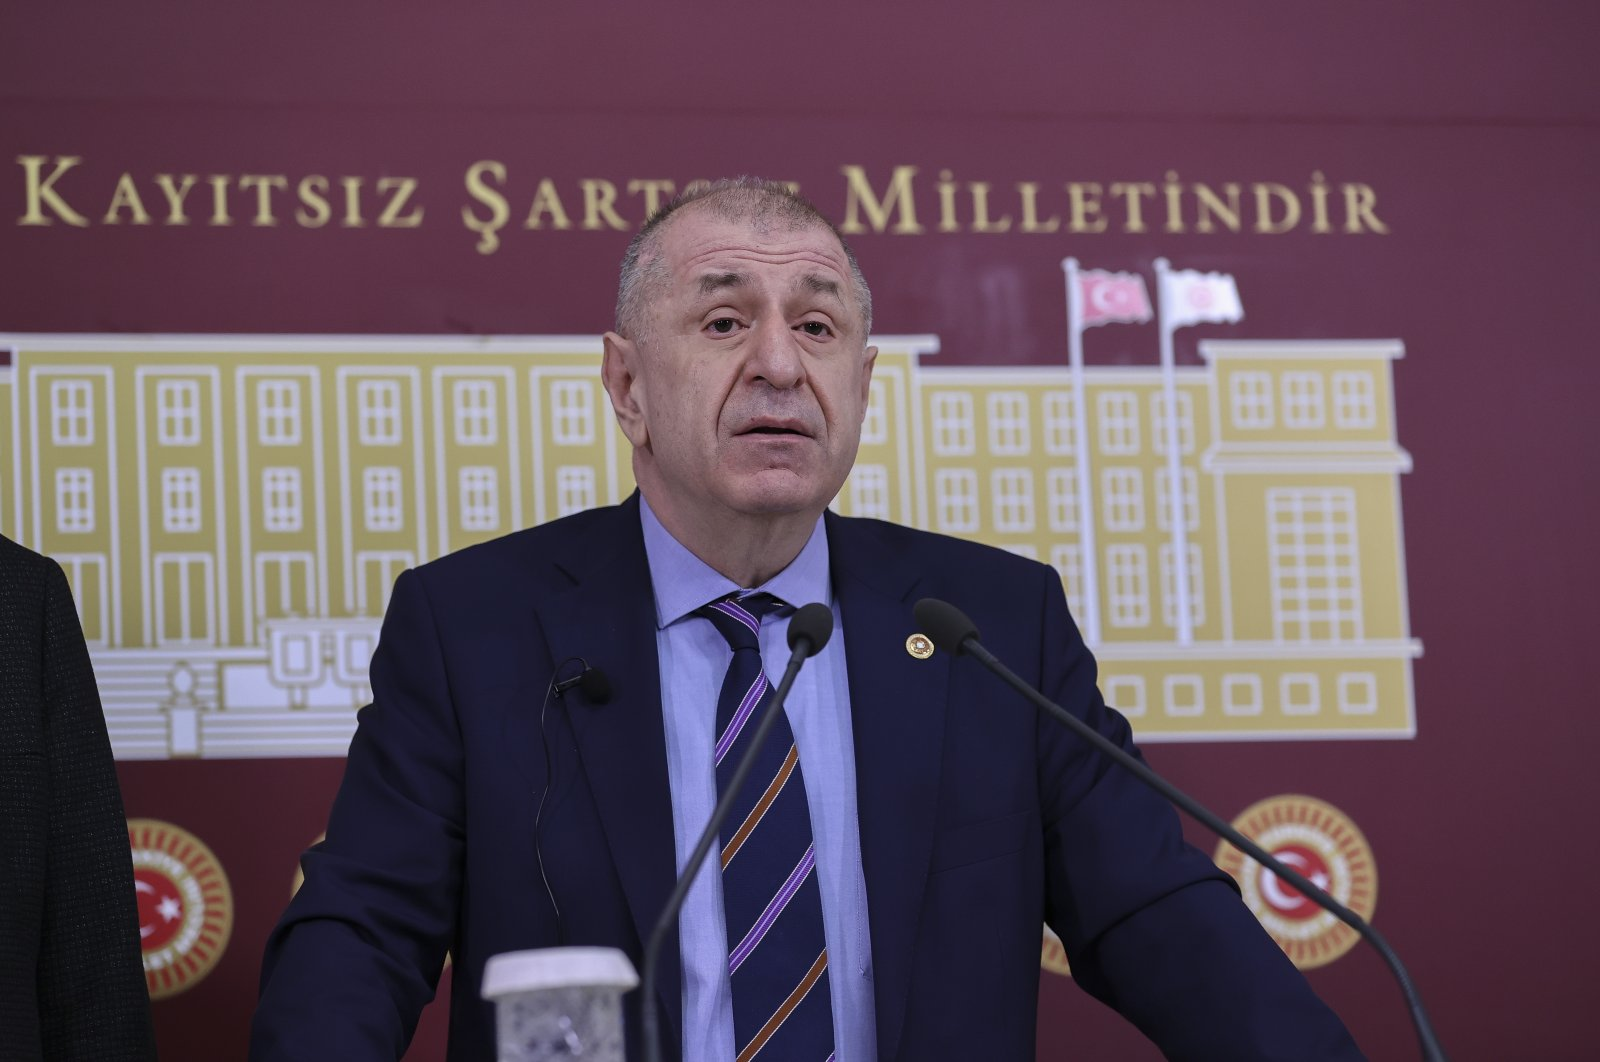 Ümit Özdağ announces his resignation from the opposition Good Party (IP) in the capital Ankara, Turkey, March 4, 2021. (AA Photo)